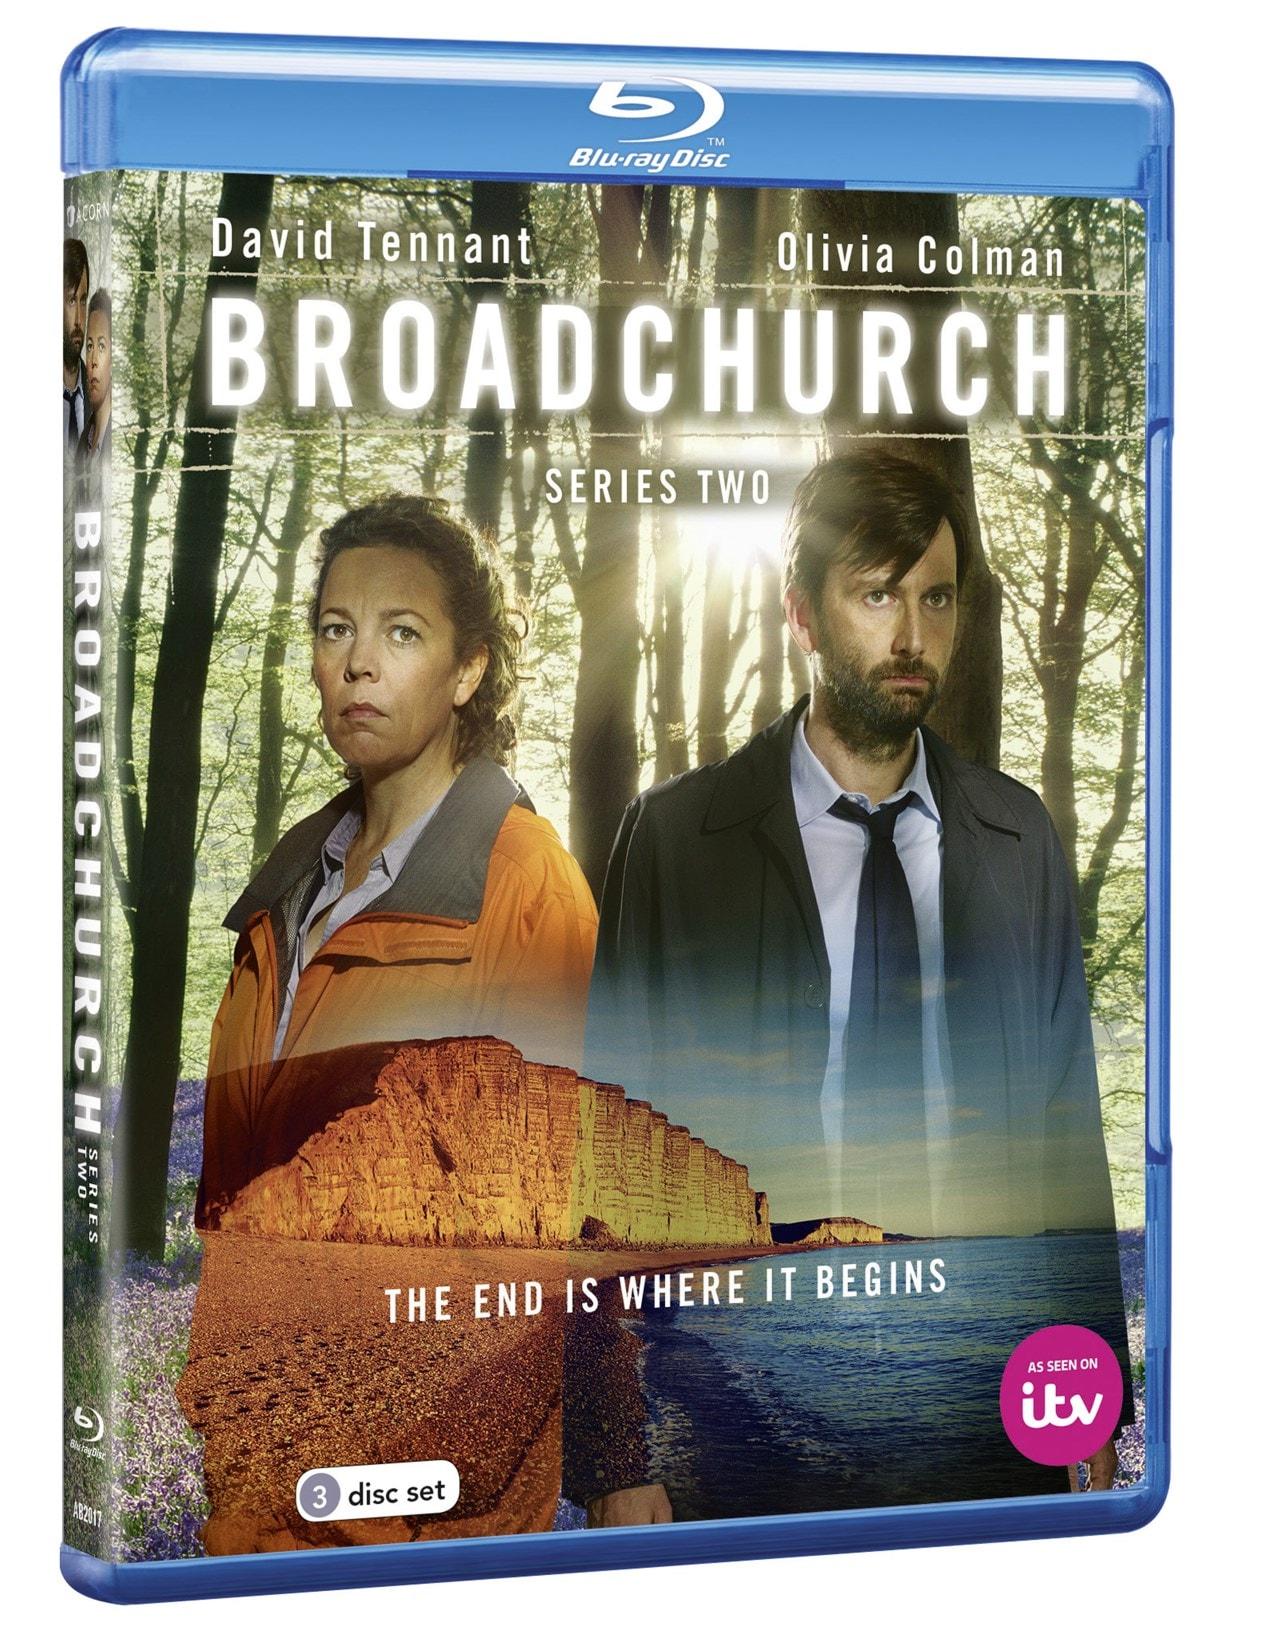 Broadchurch: Series 2 - 1